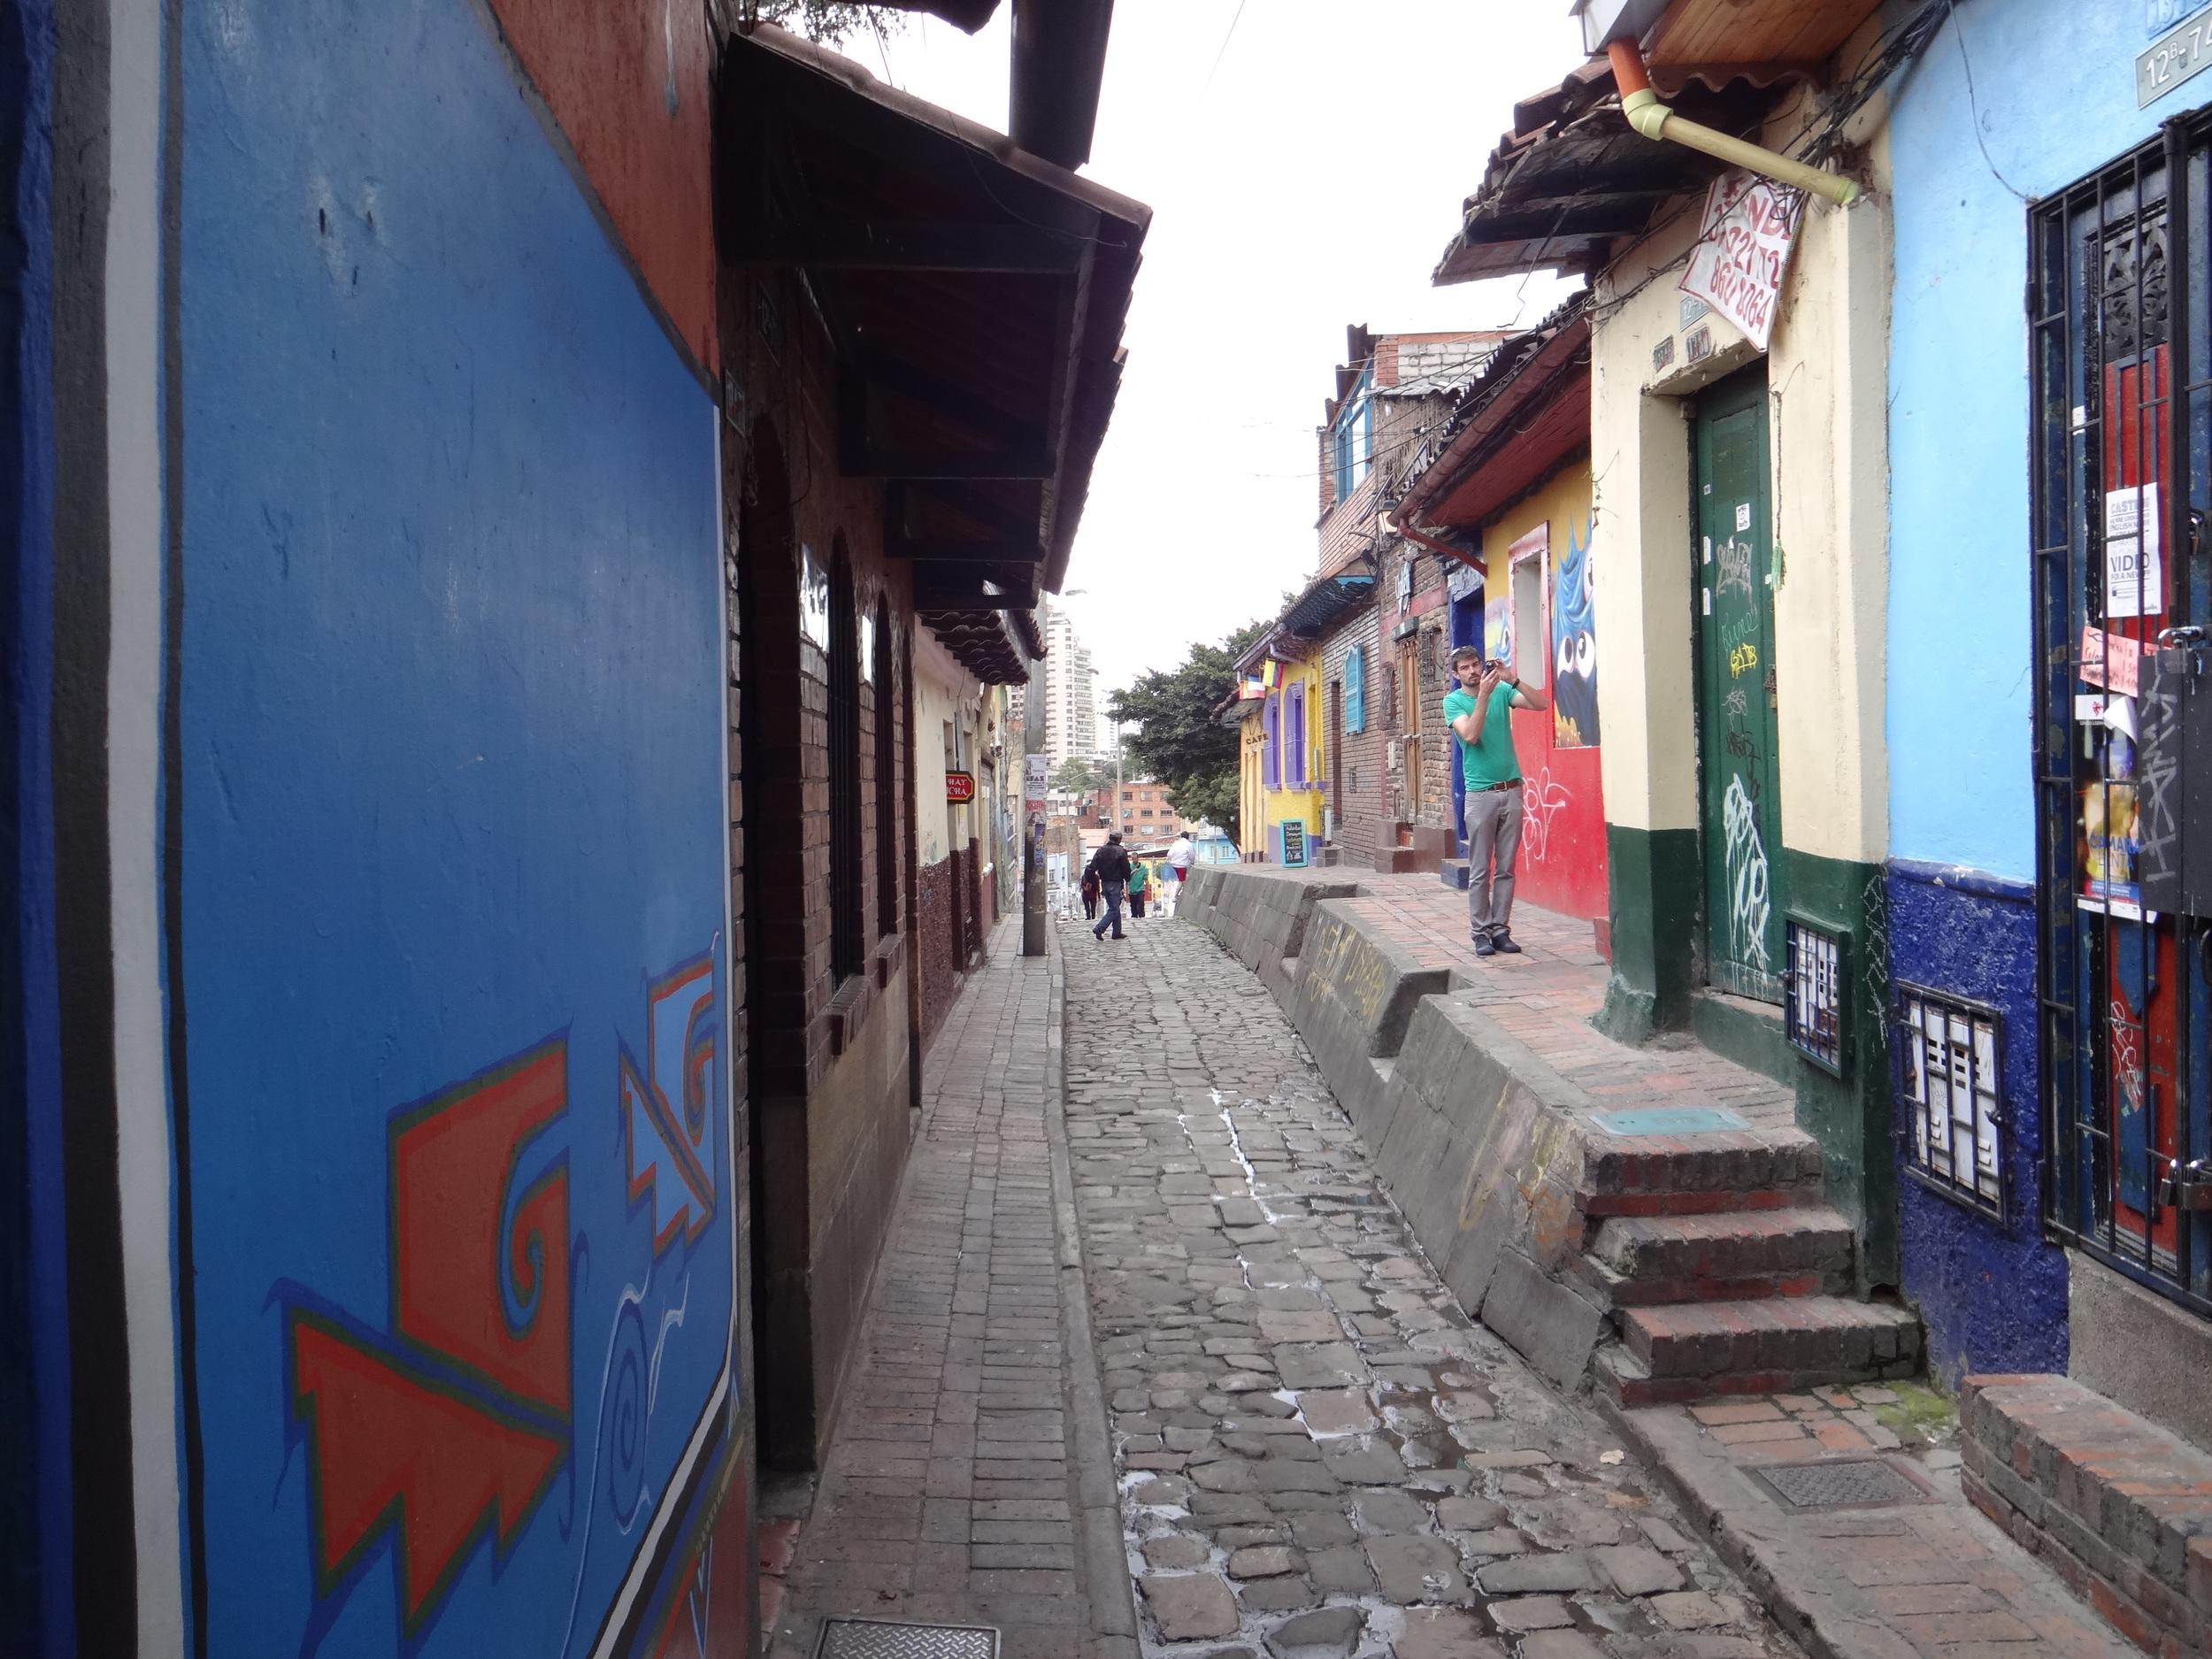 The narrow streets of La Candelaria.